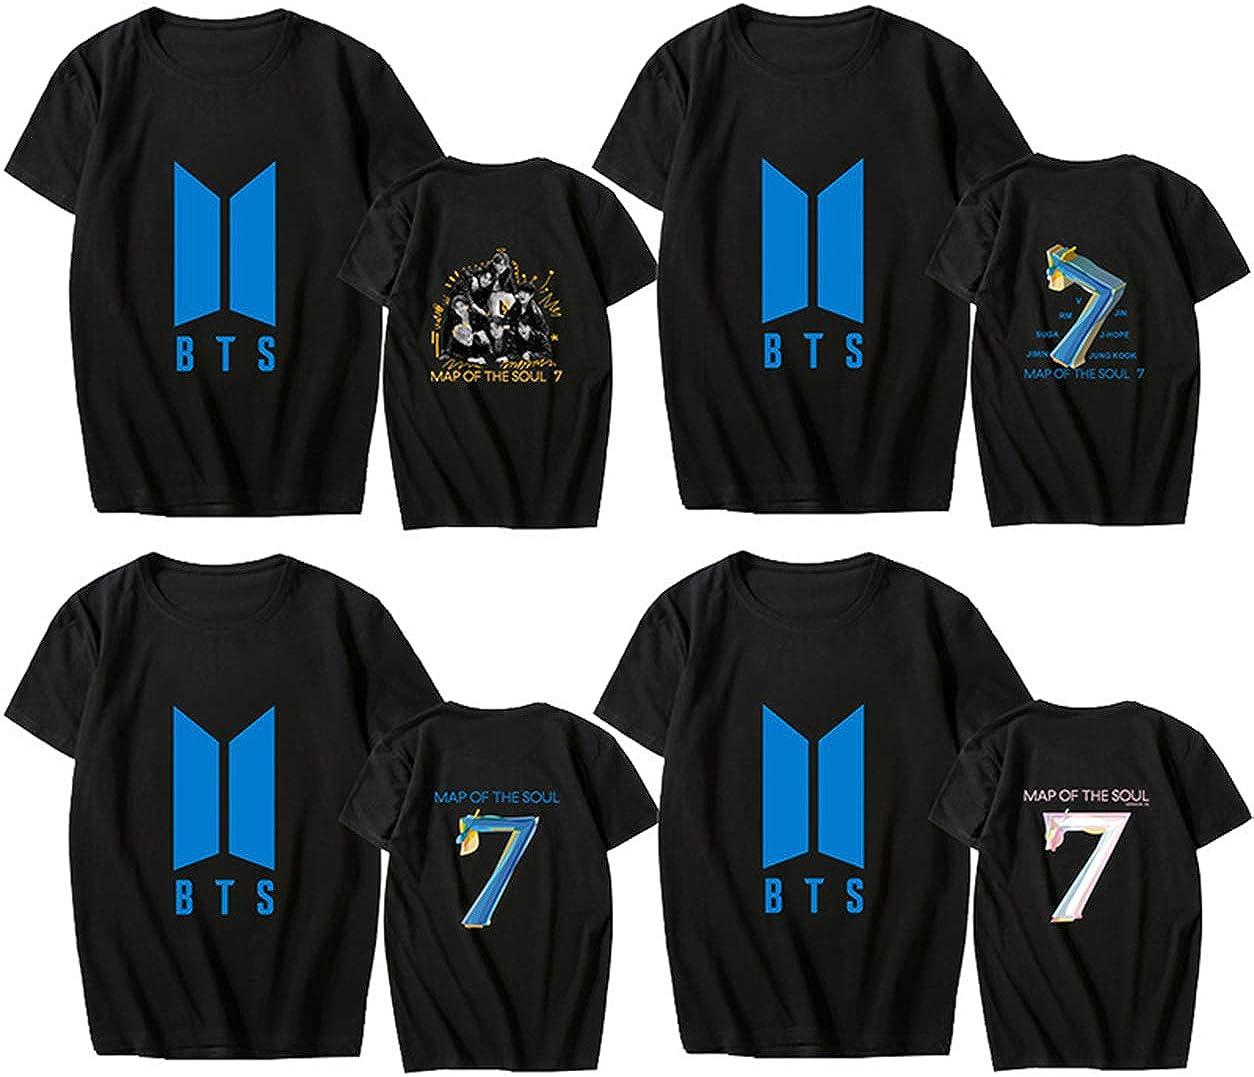 ACEFAST INC Kpop BTS Shirt Map of The Soul 7 T Shirt V Jimin Suga Jungkook RM J-Hope T-Shirt